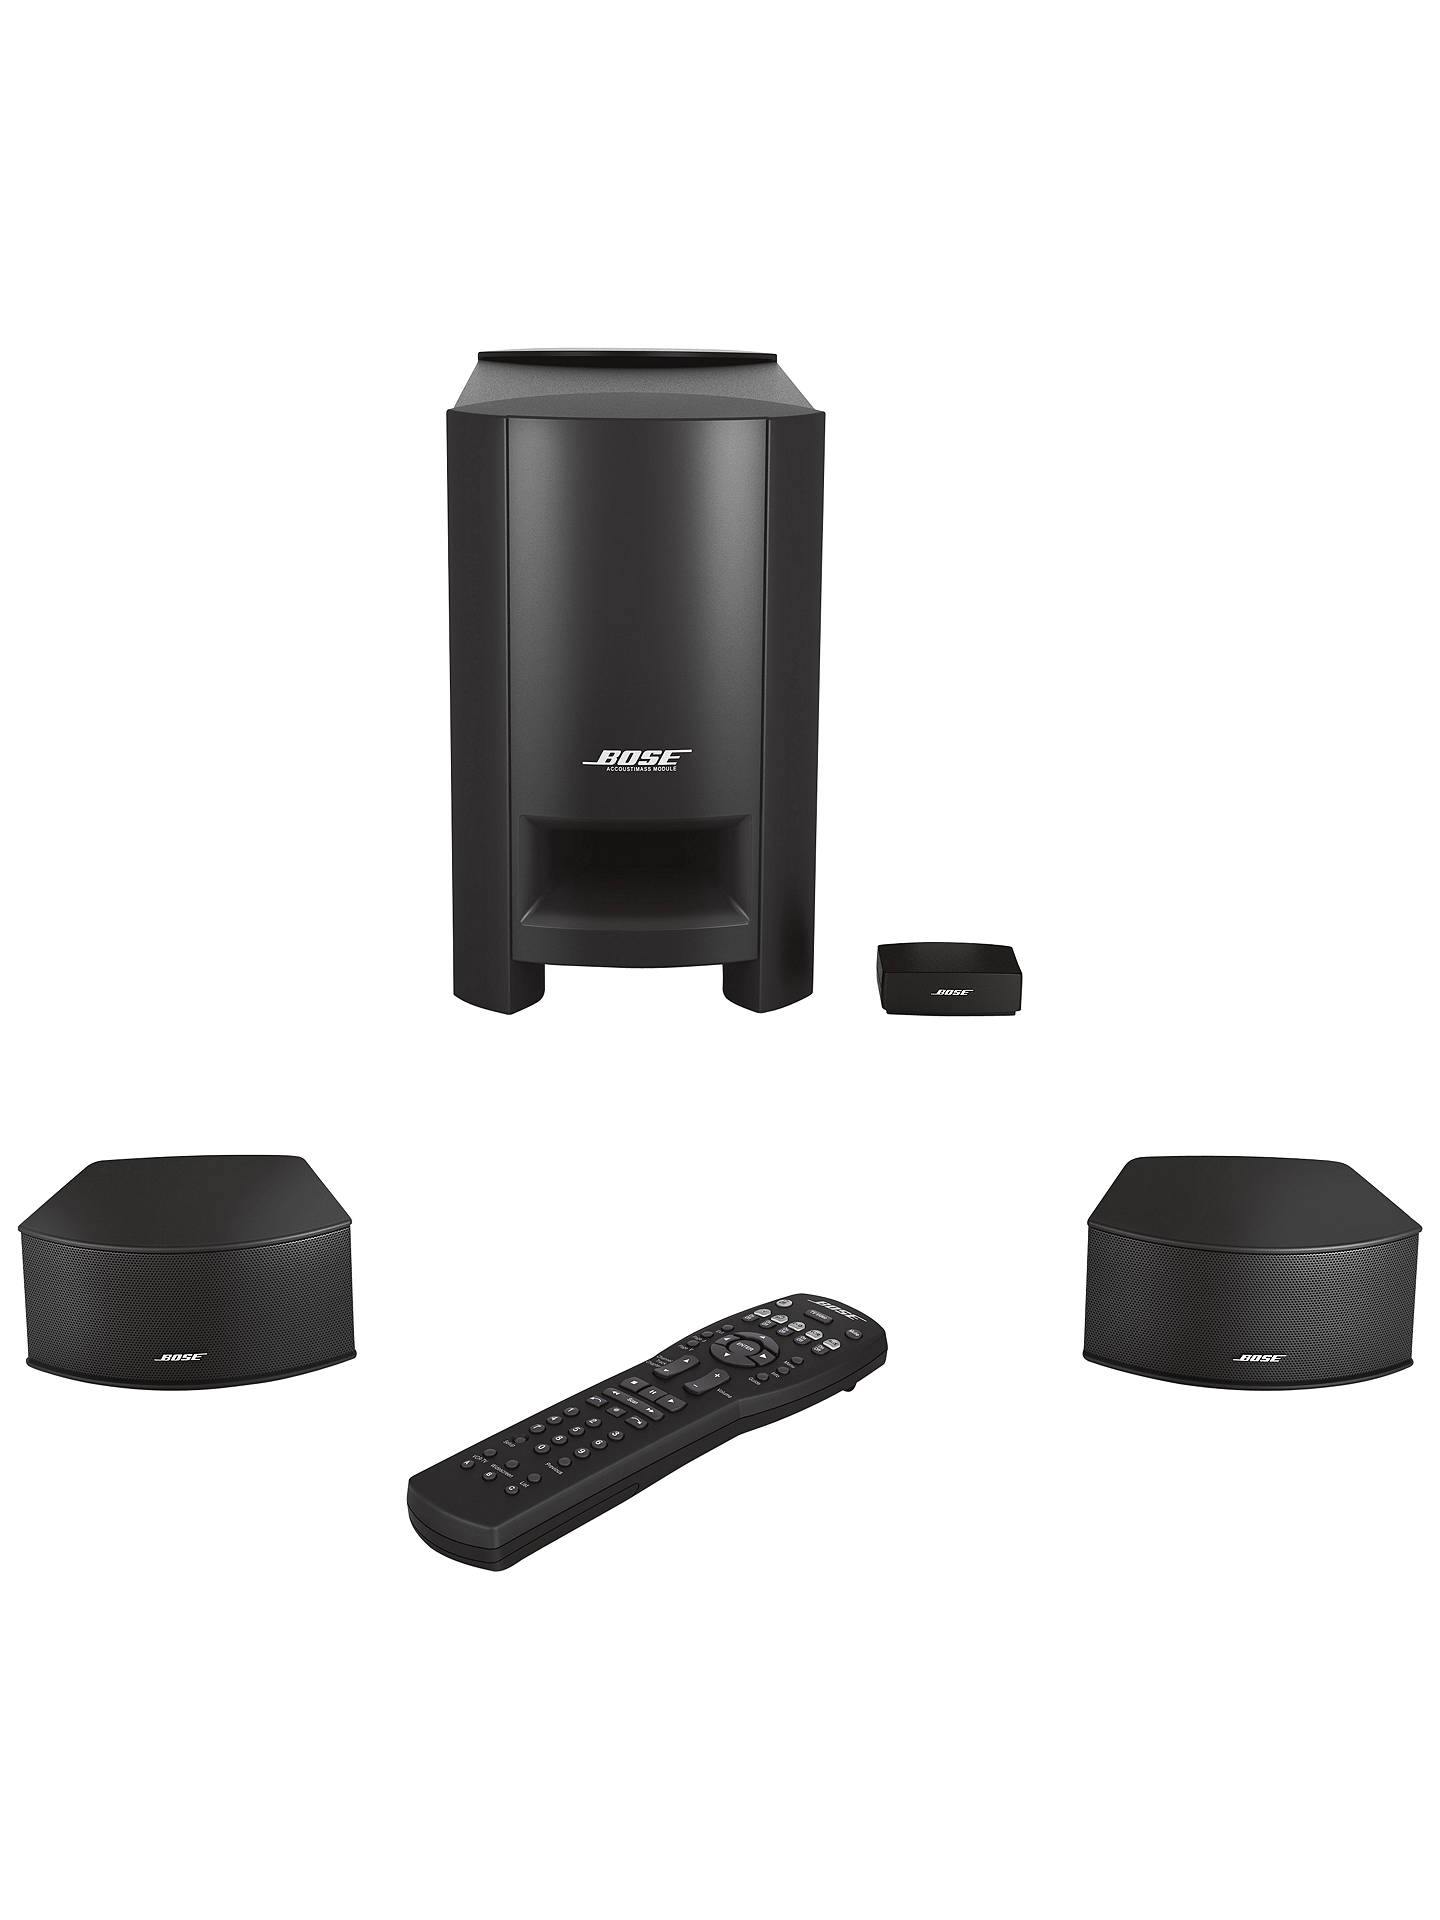 Bose cinemate gs ii 21 home cinema speaker system at john lewis buybose cinemate gs ii 21 home cinema speaker system online at johnlewis publicscrutiny Choice Image